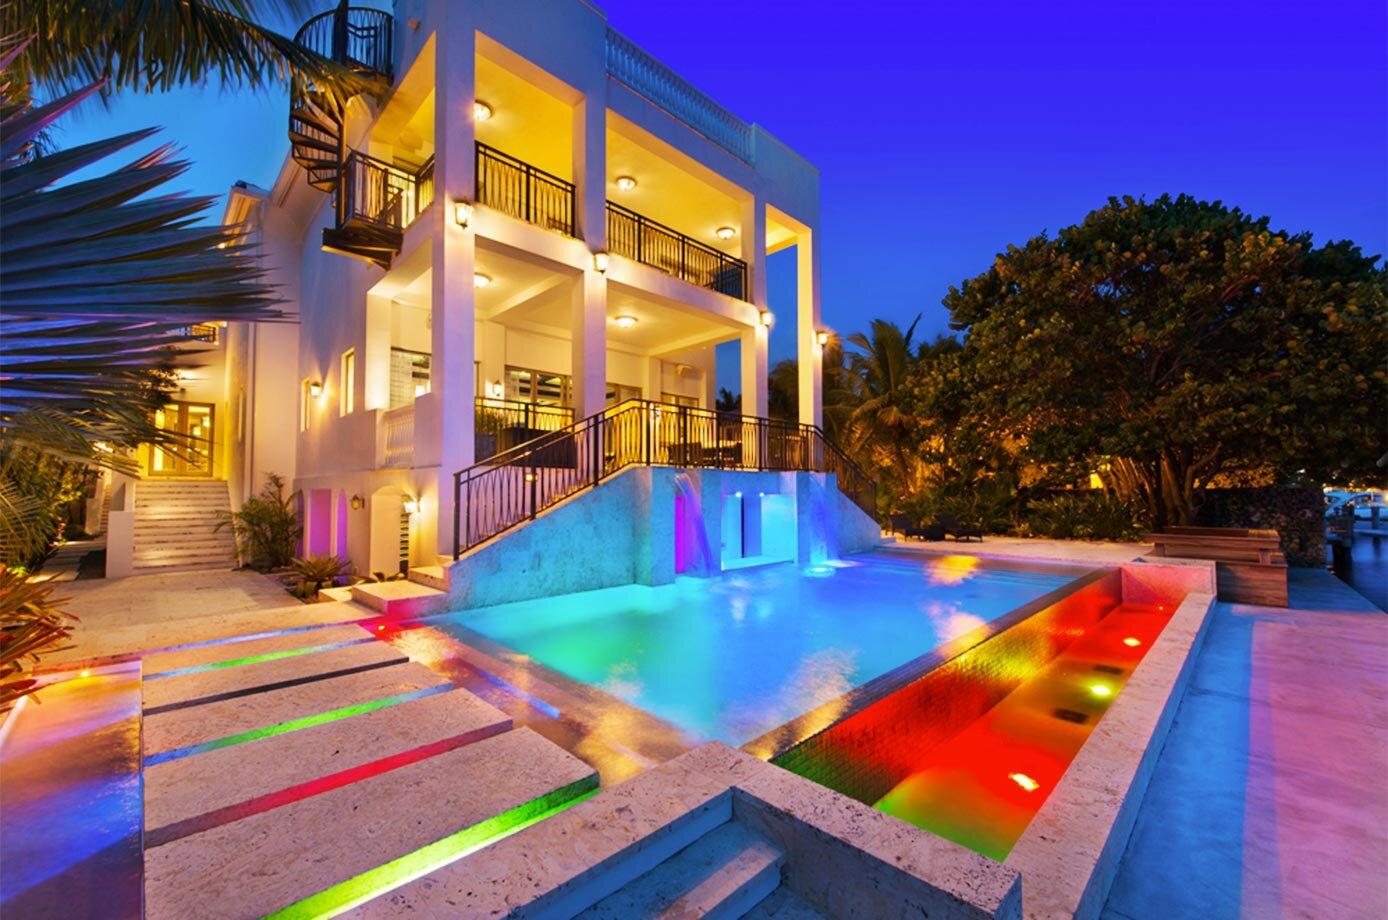 Chris Bosh's 11,709-square-foot home at 6396 N. Bay Rd., Miami Beach.